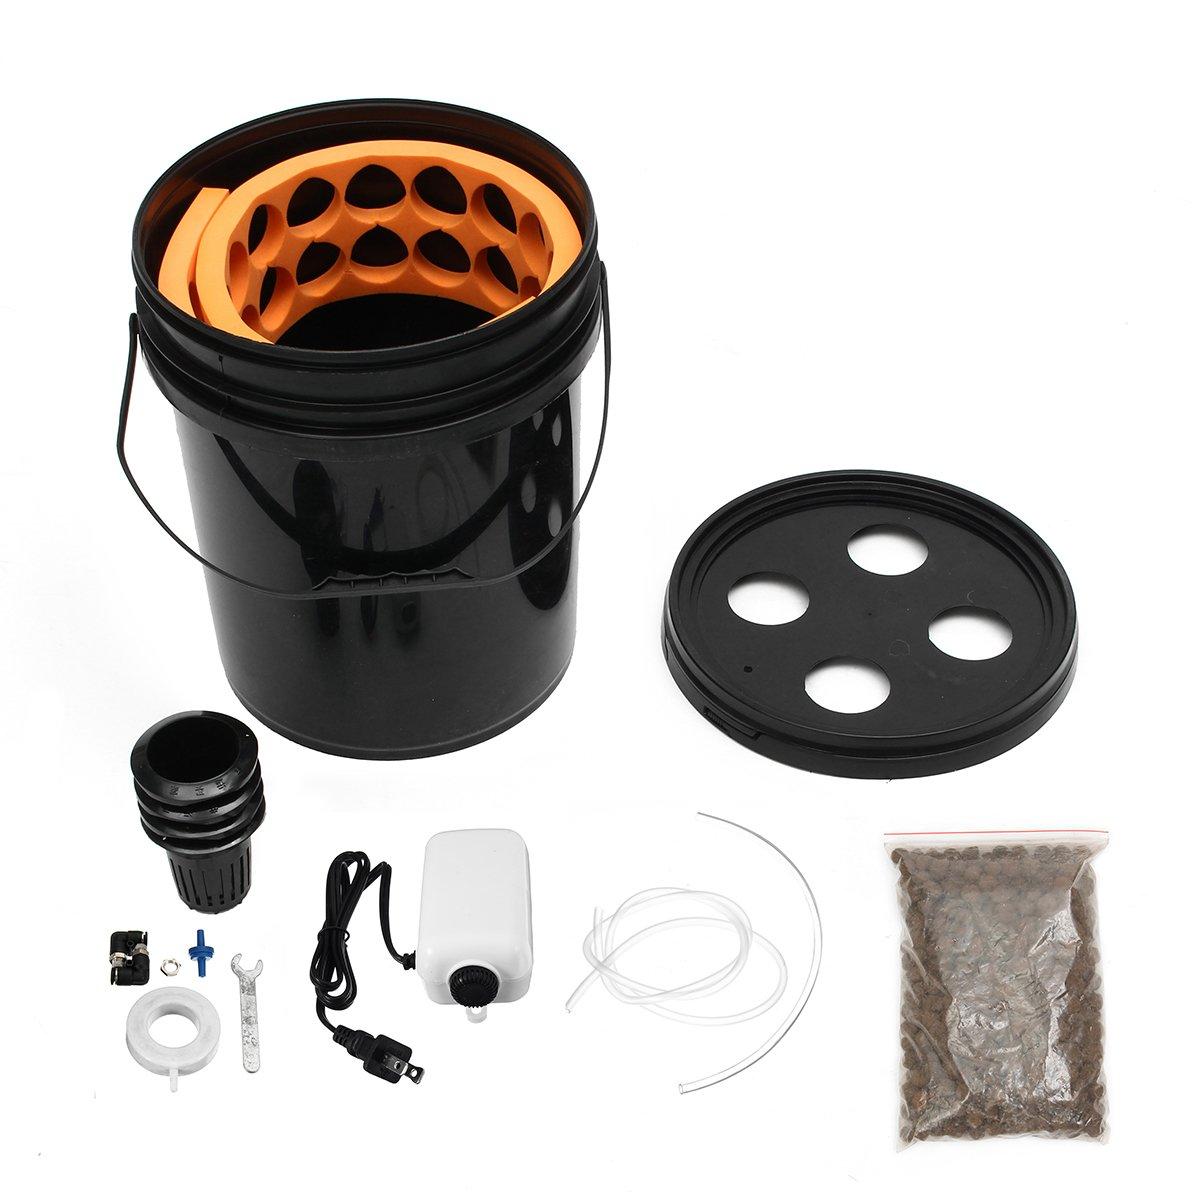 EsportsMJJ 4 Löcher Hydrokultur Eimer System Oxy Pot Bubbler Dwc Tiefwasser Kultur Growing Box Kit